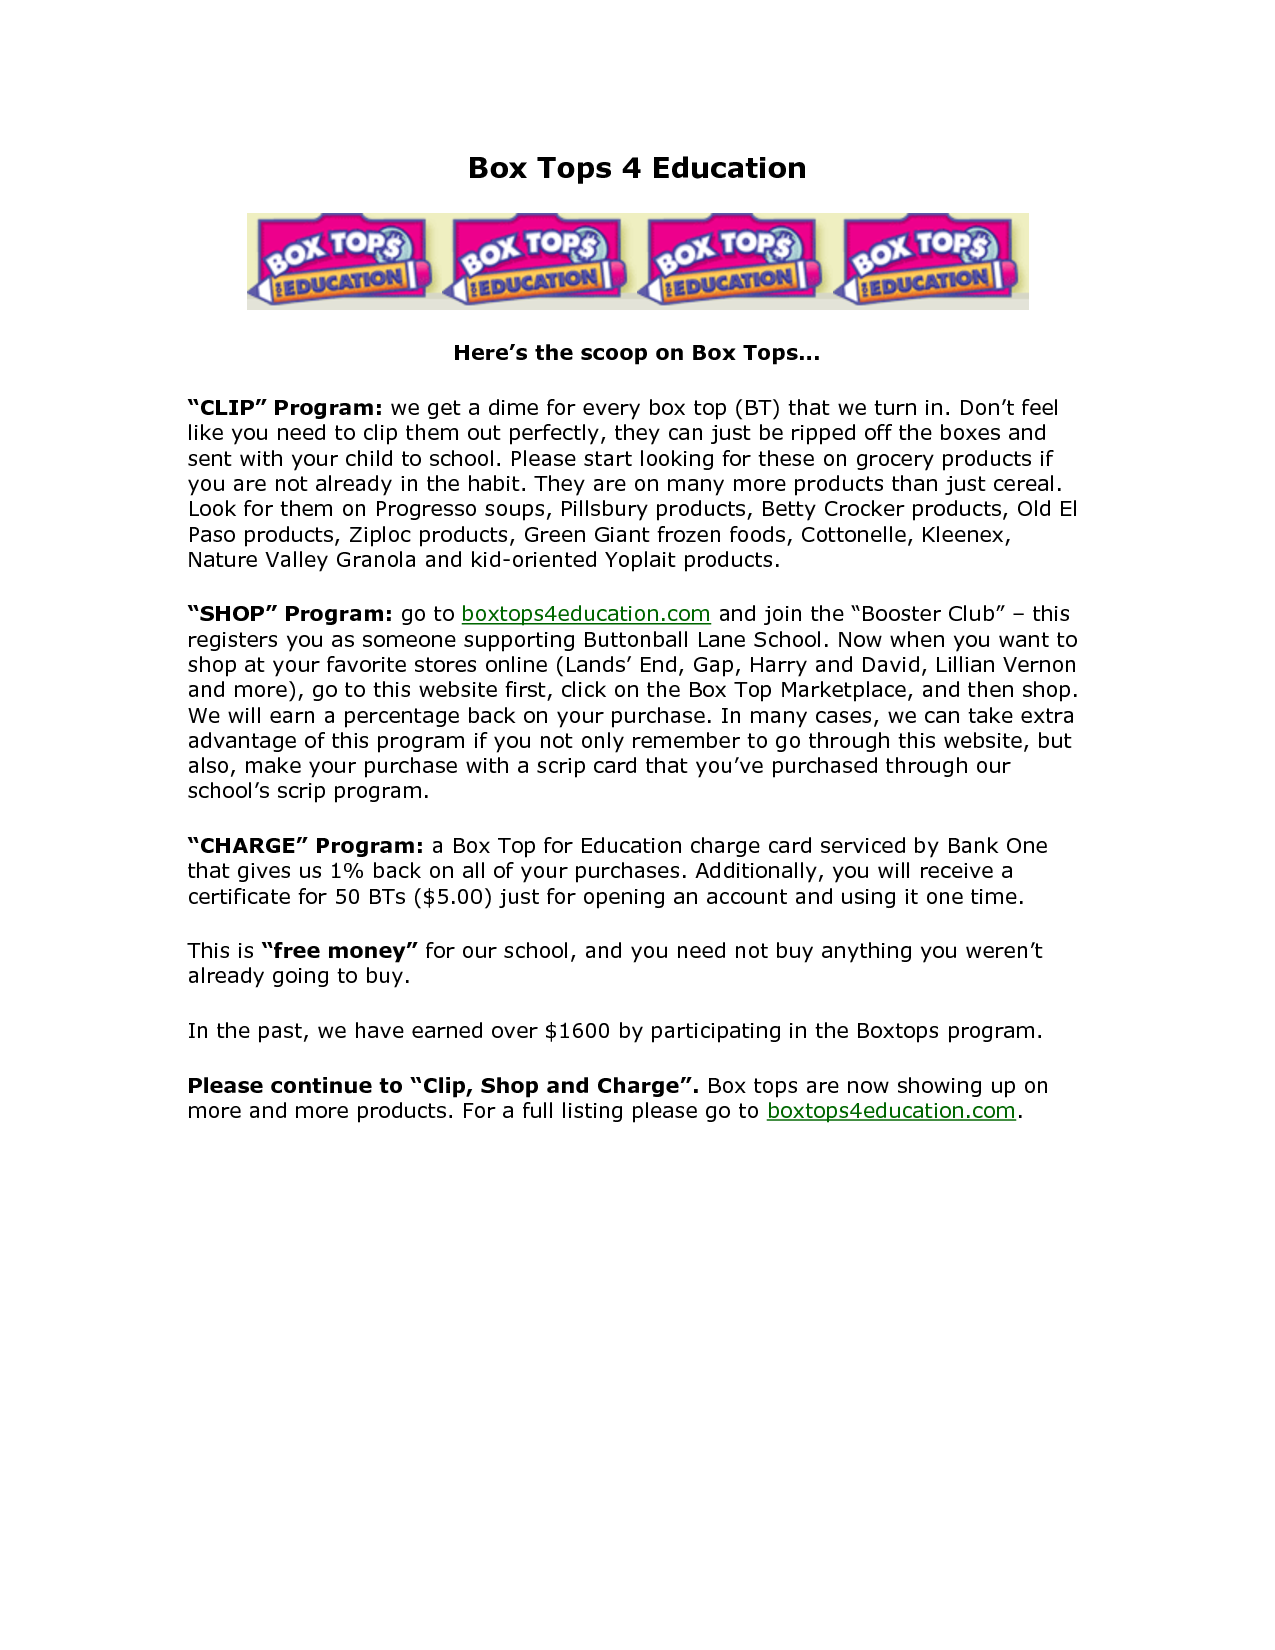 scope of work template | PTA | Pinterest | Box tops, Pta and School